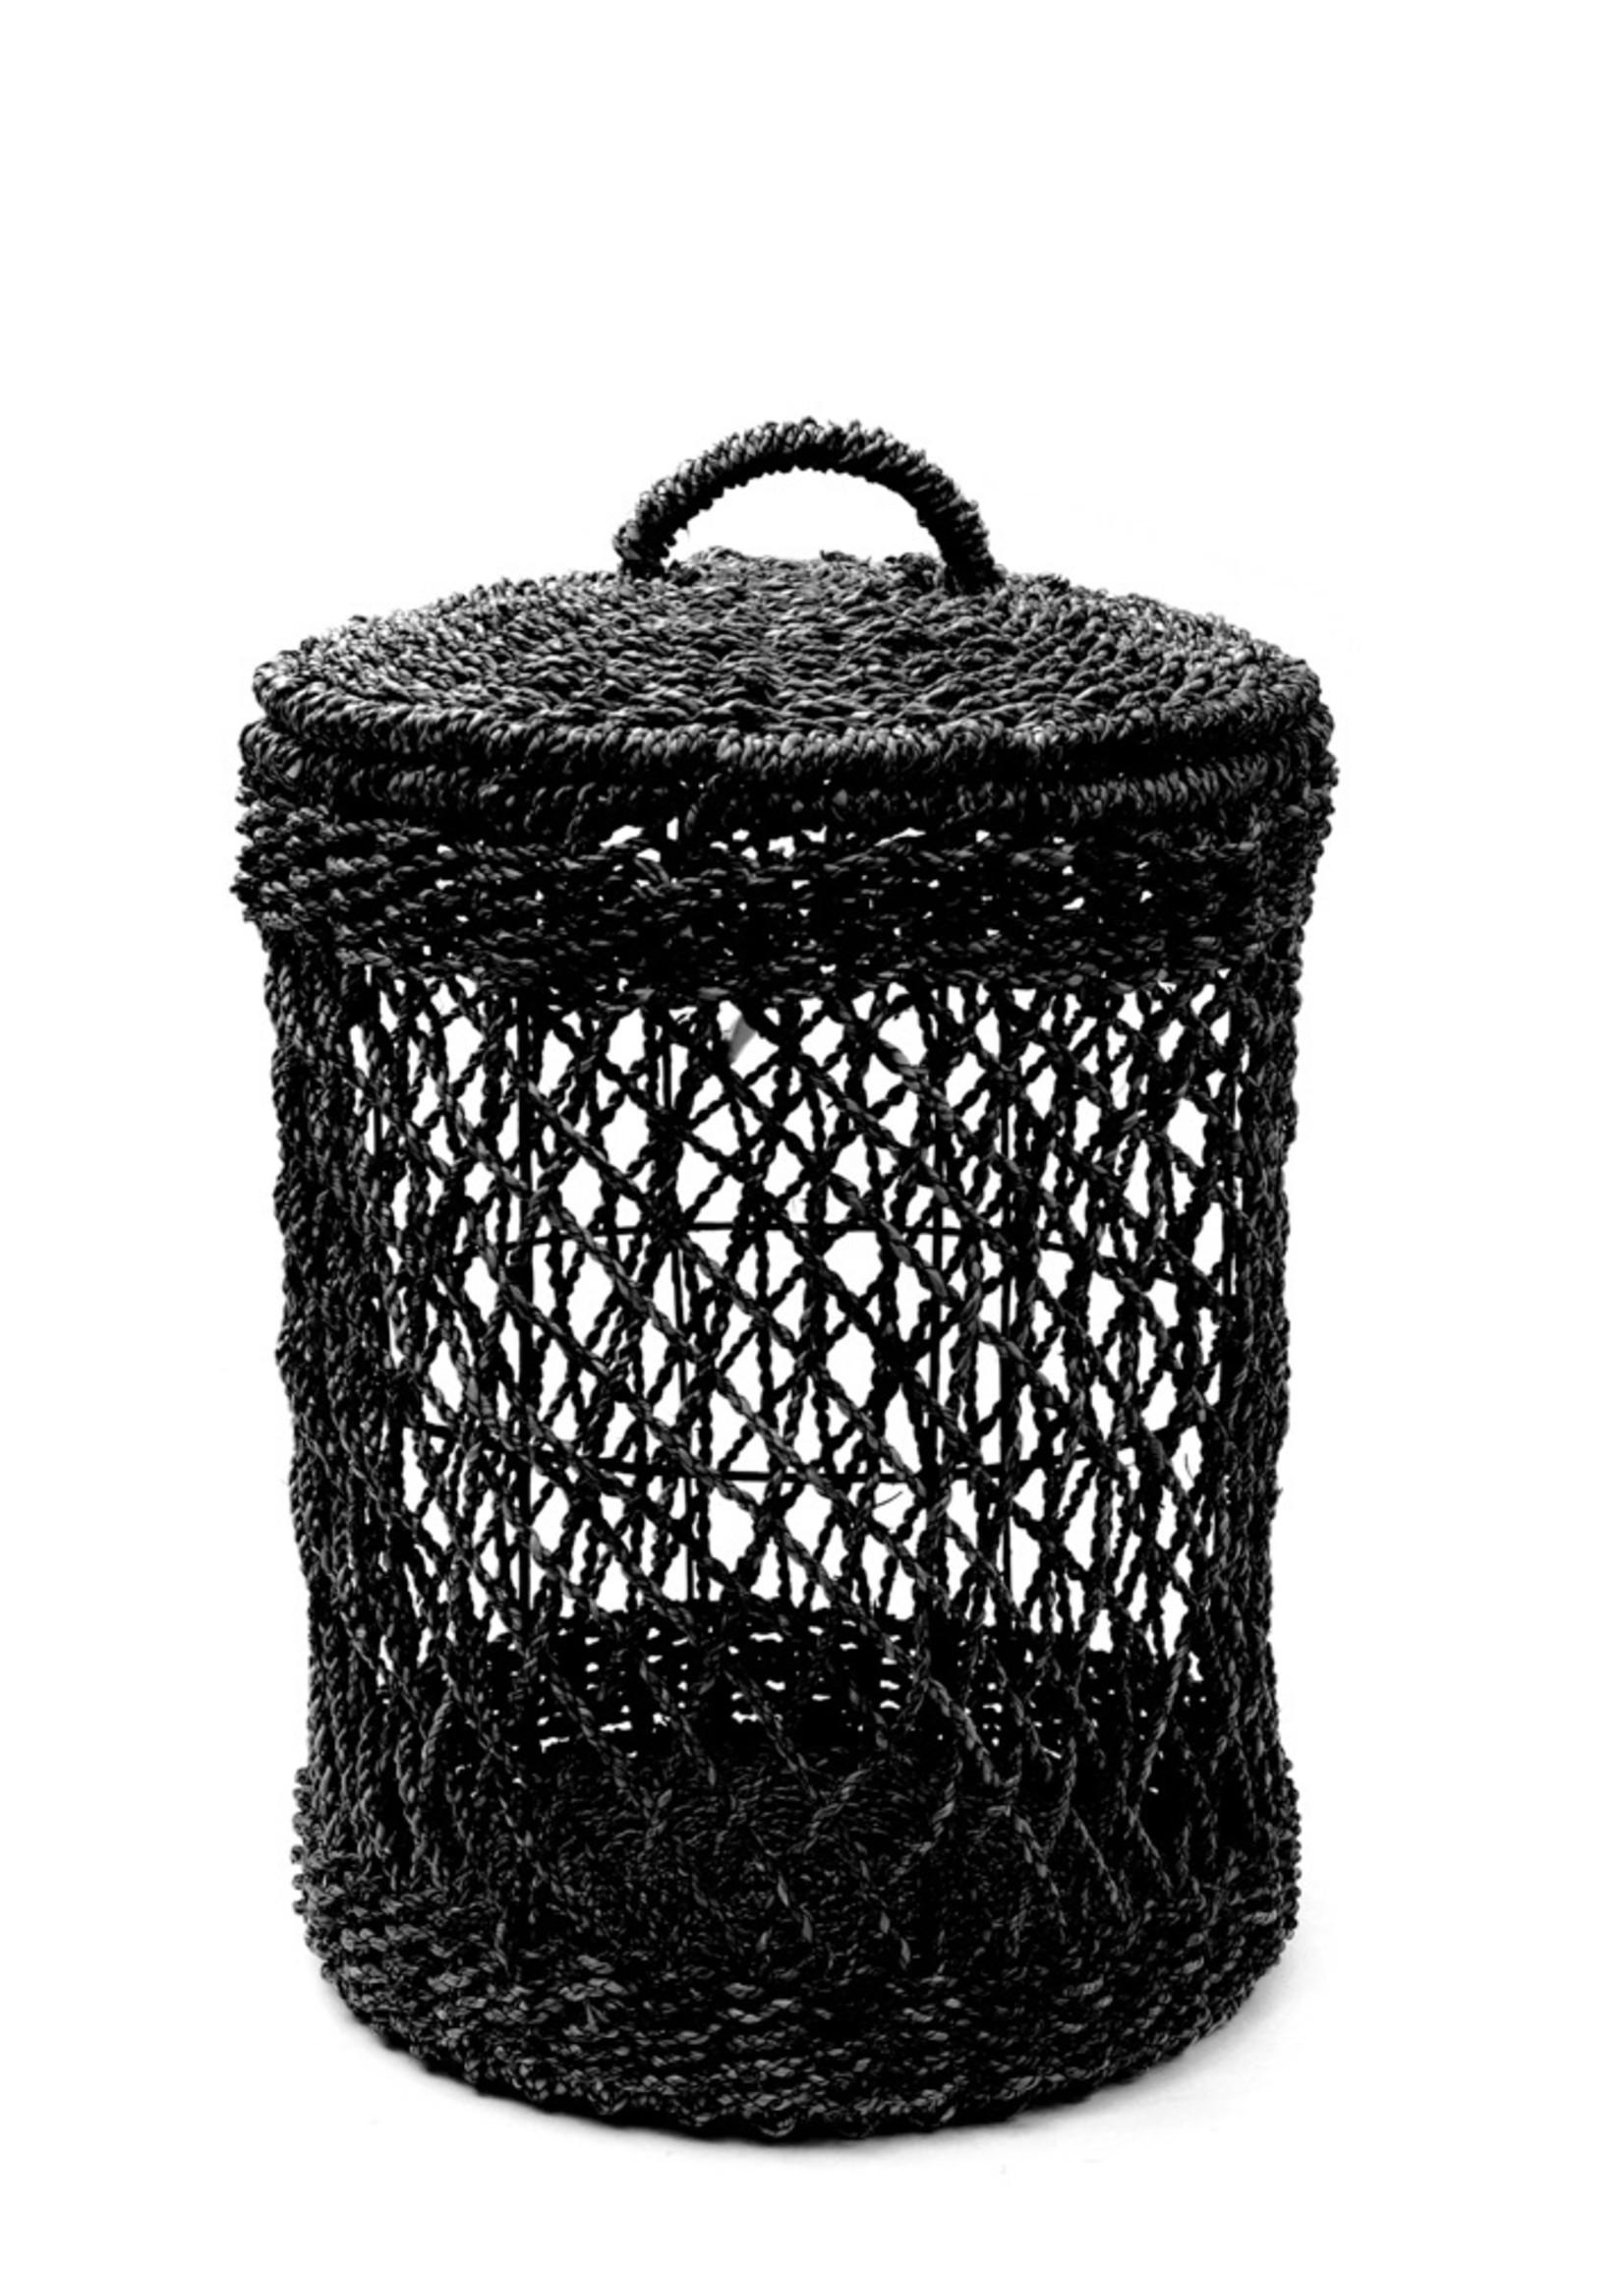 The Laundry Basket - Black - M